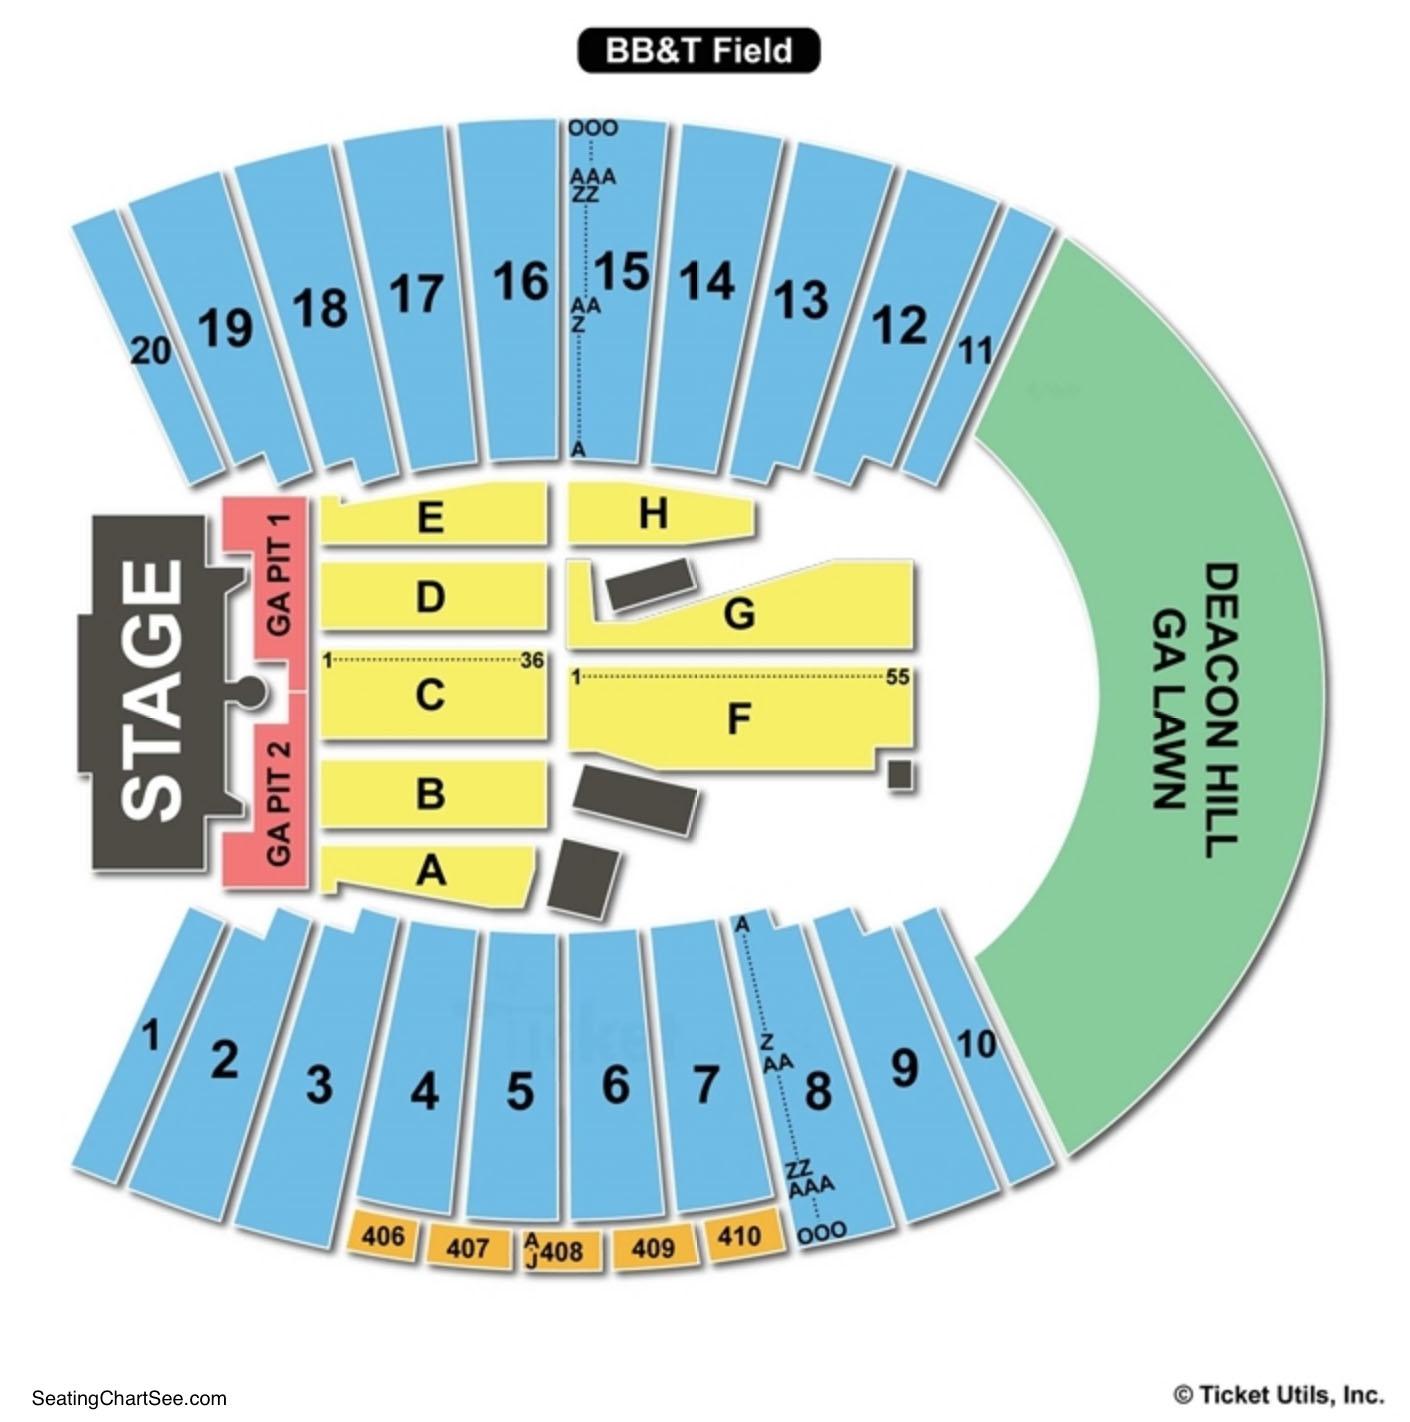 BB&T Field Concert Seating Chart (Winston-Salem)